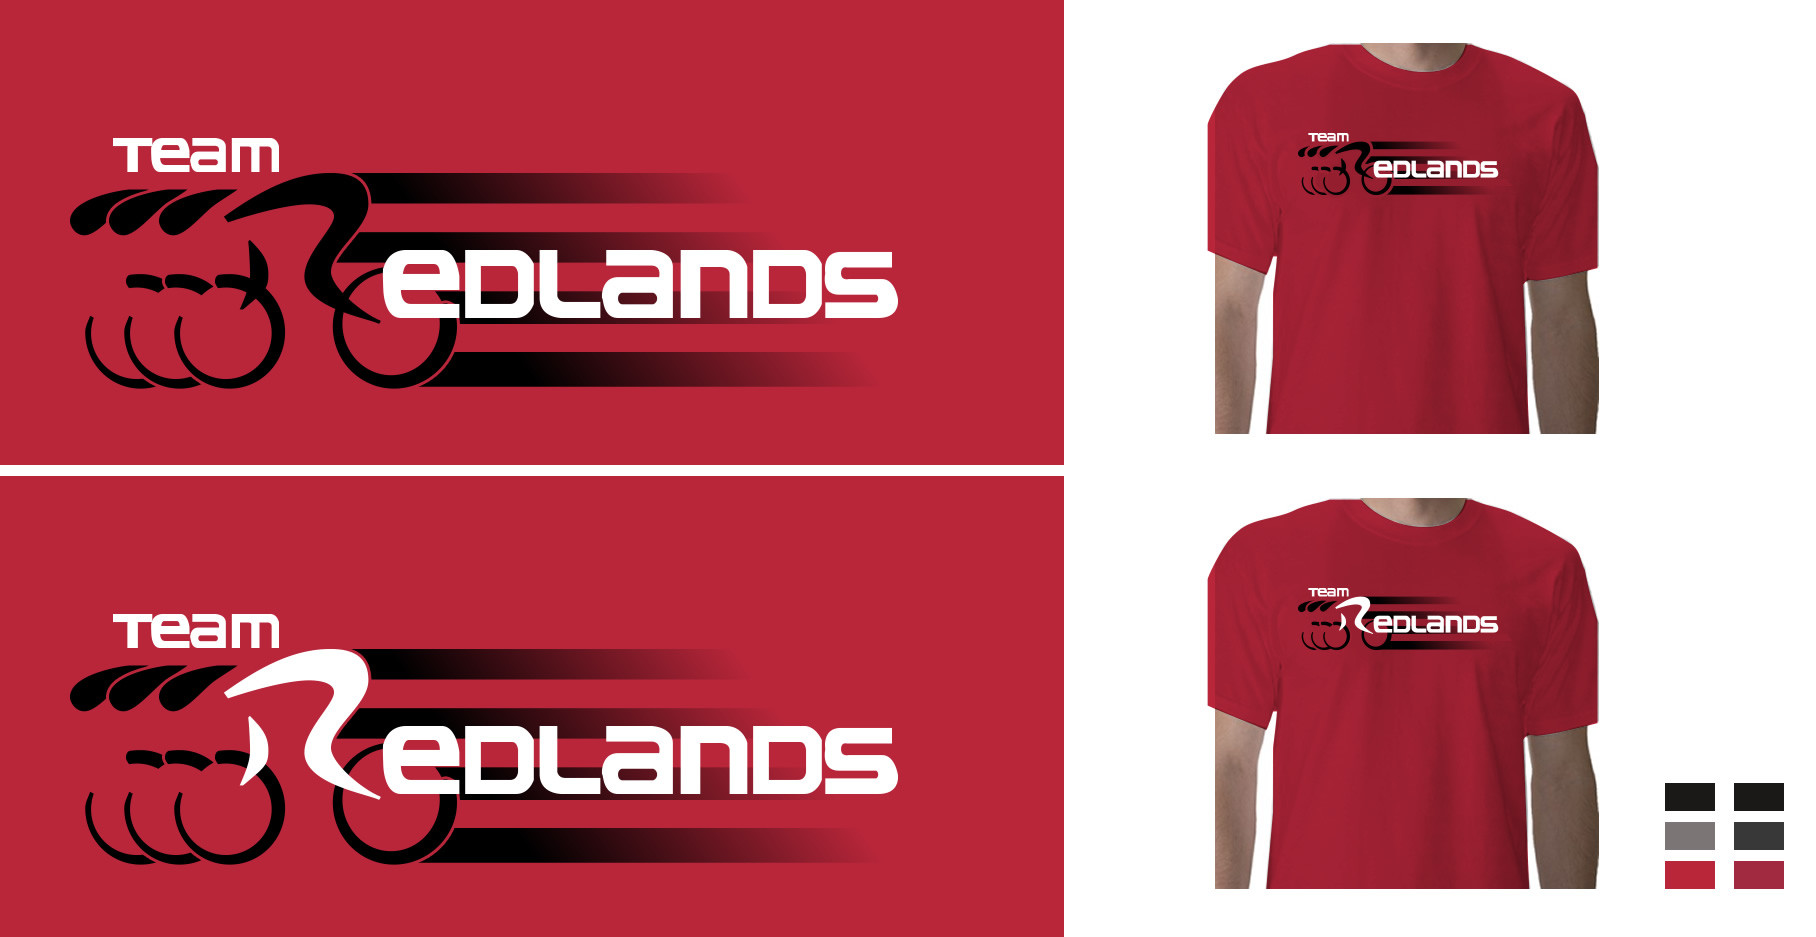 Jeff mcdowall team redlands jeff version